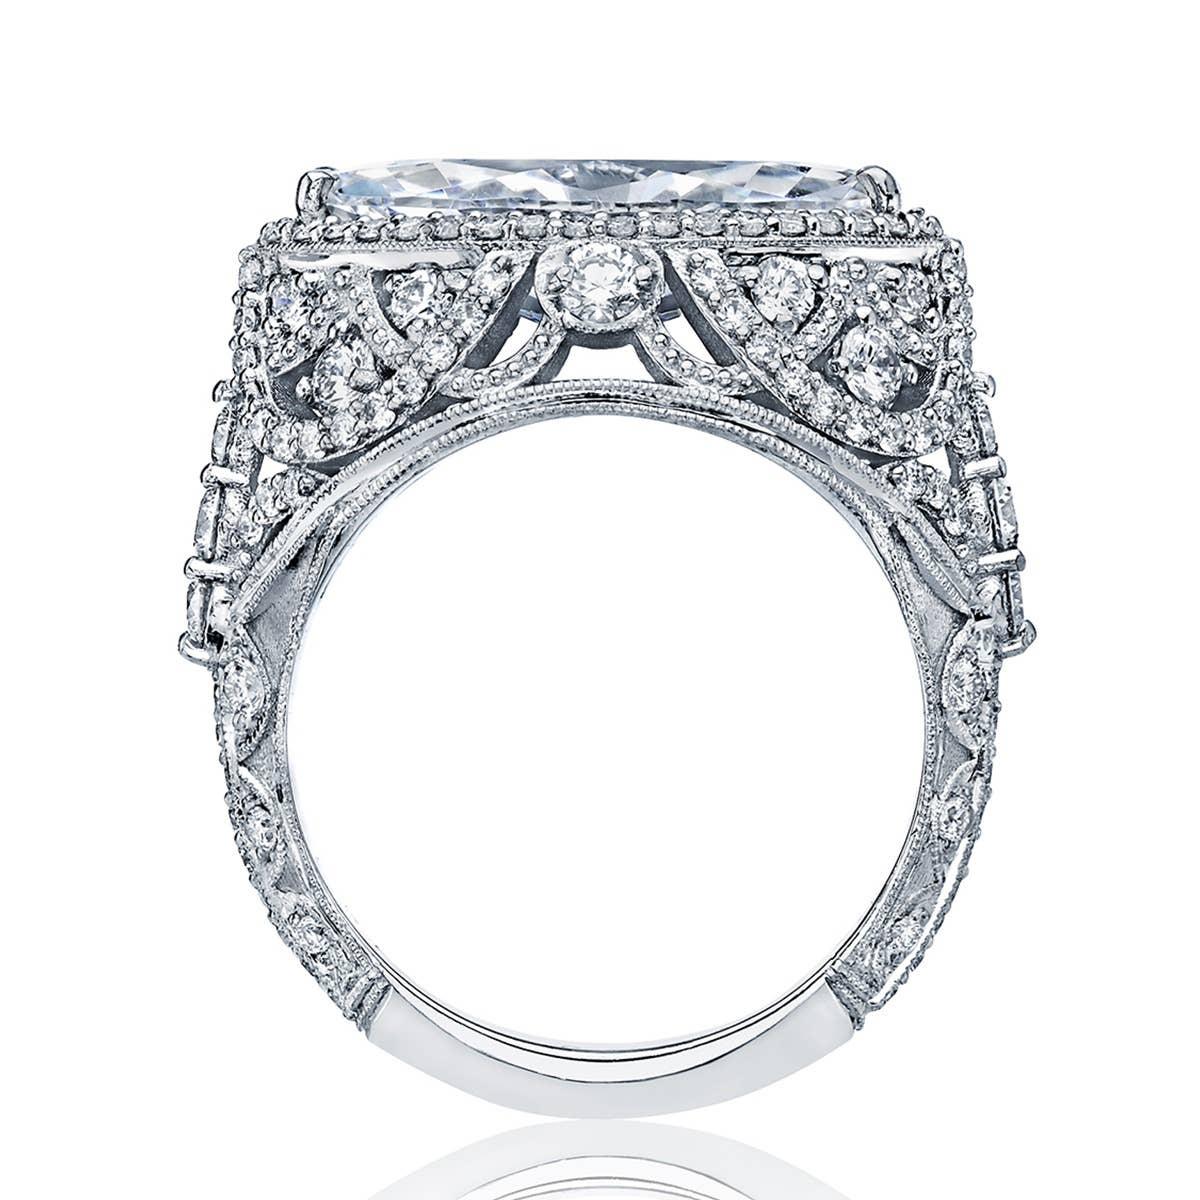 ht2612mq by Tacori - RoyalT Marquise engagement ring